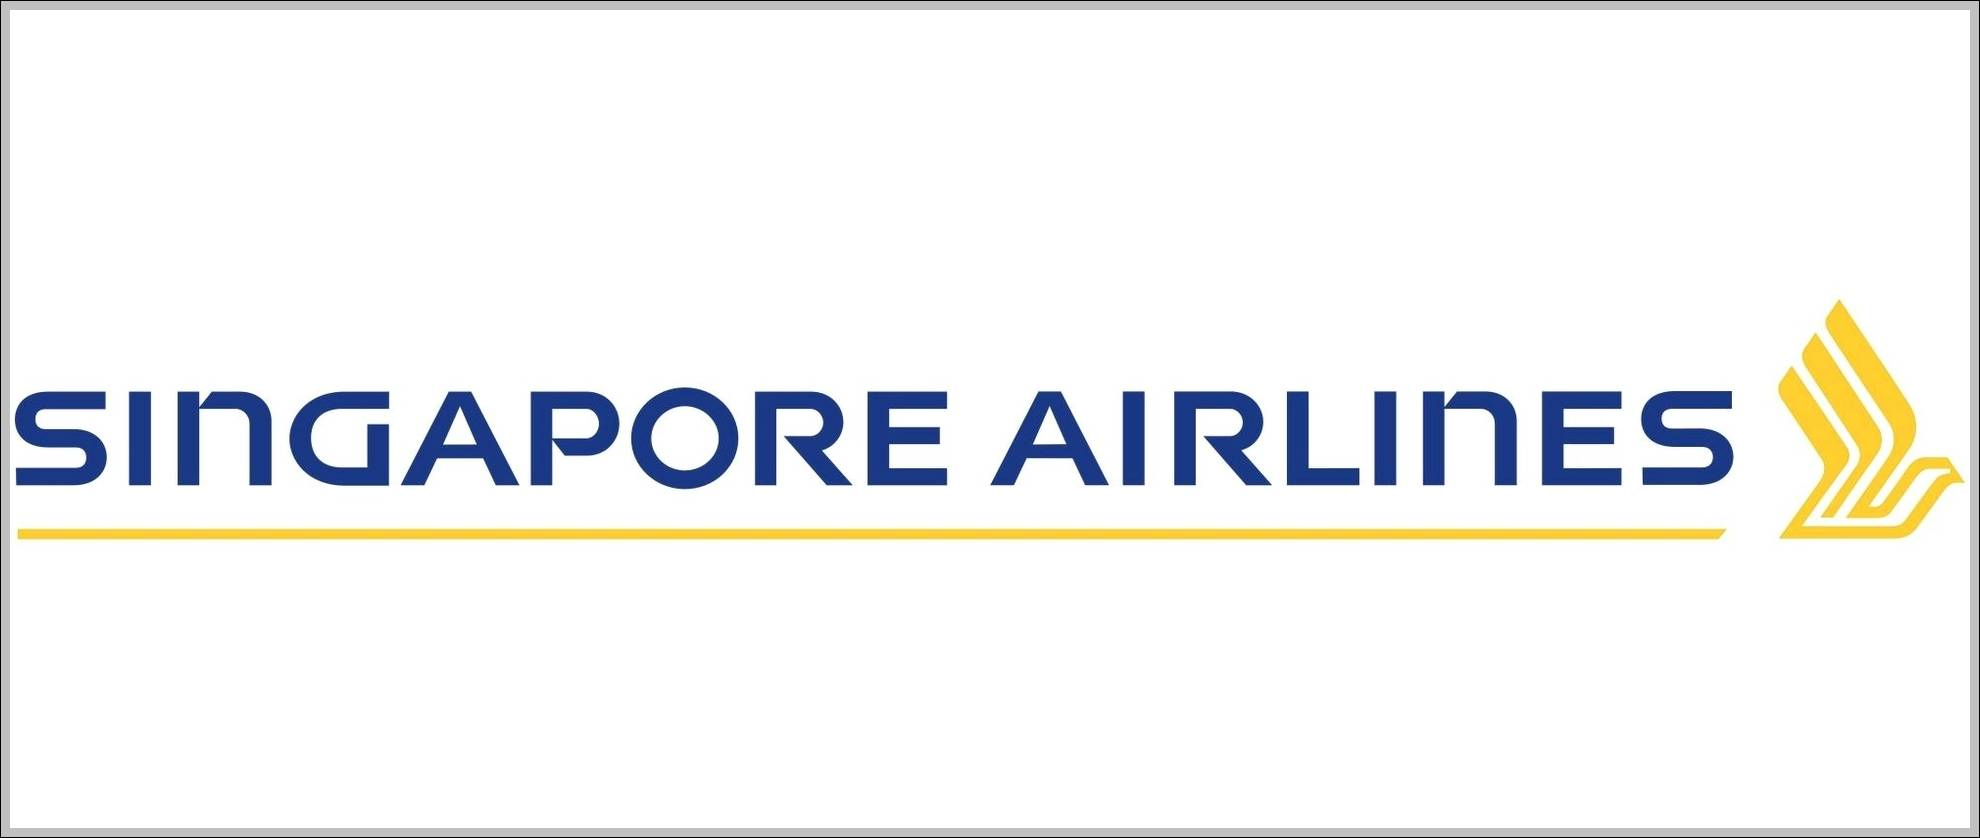 Singapore Airlines logo horizontal